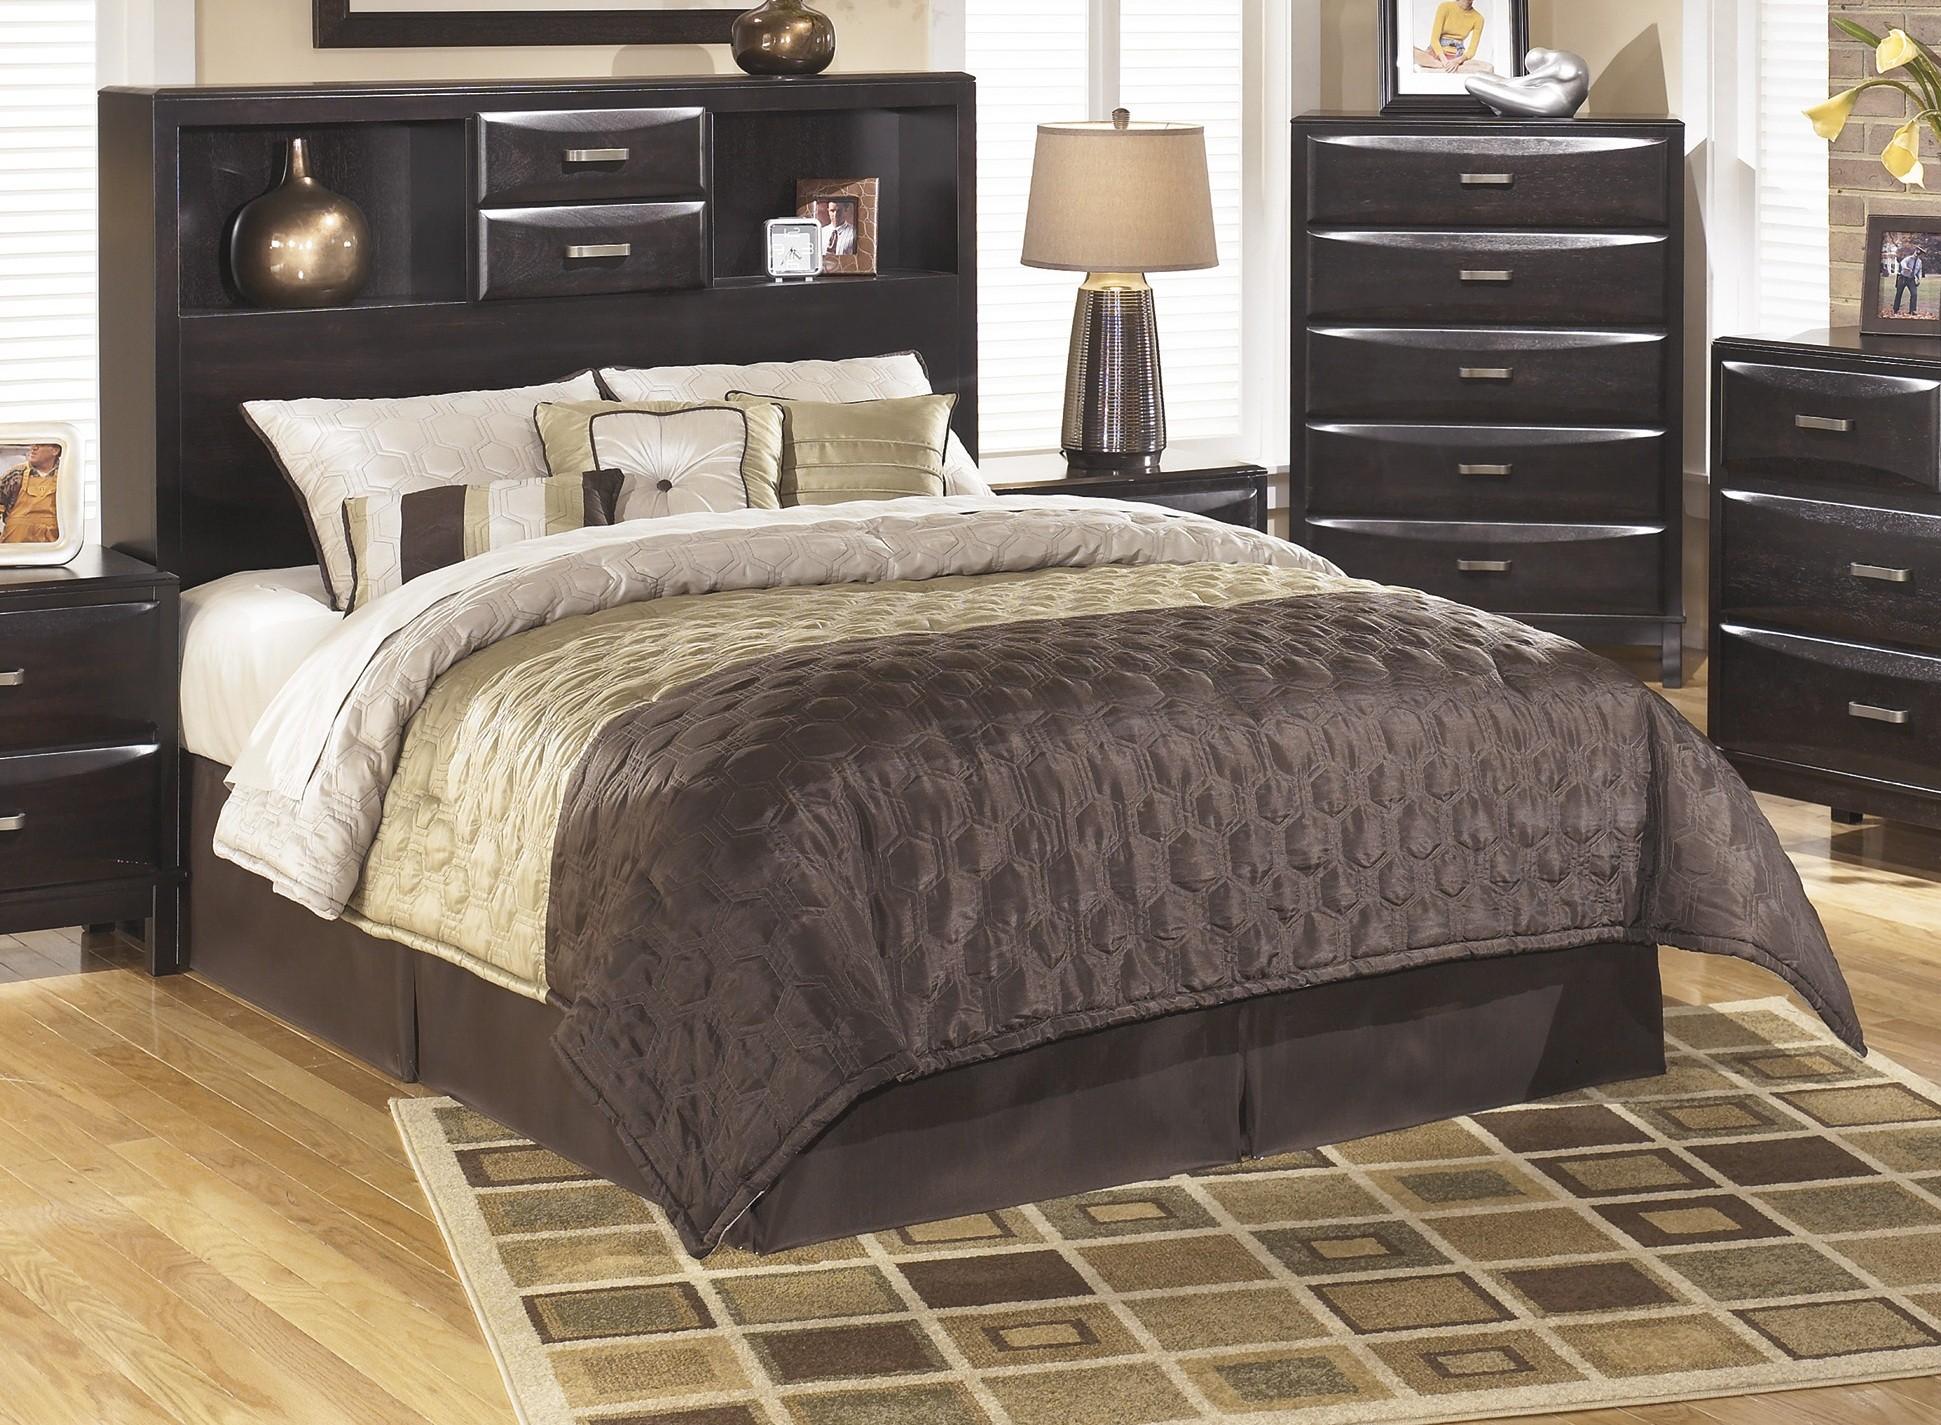 cal king headboards design homesfeed. Black Bedroom Furniture Sets. Home Design Ideas